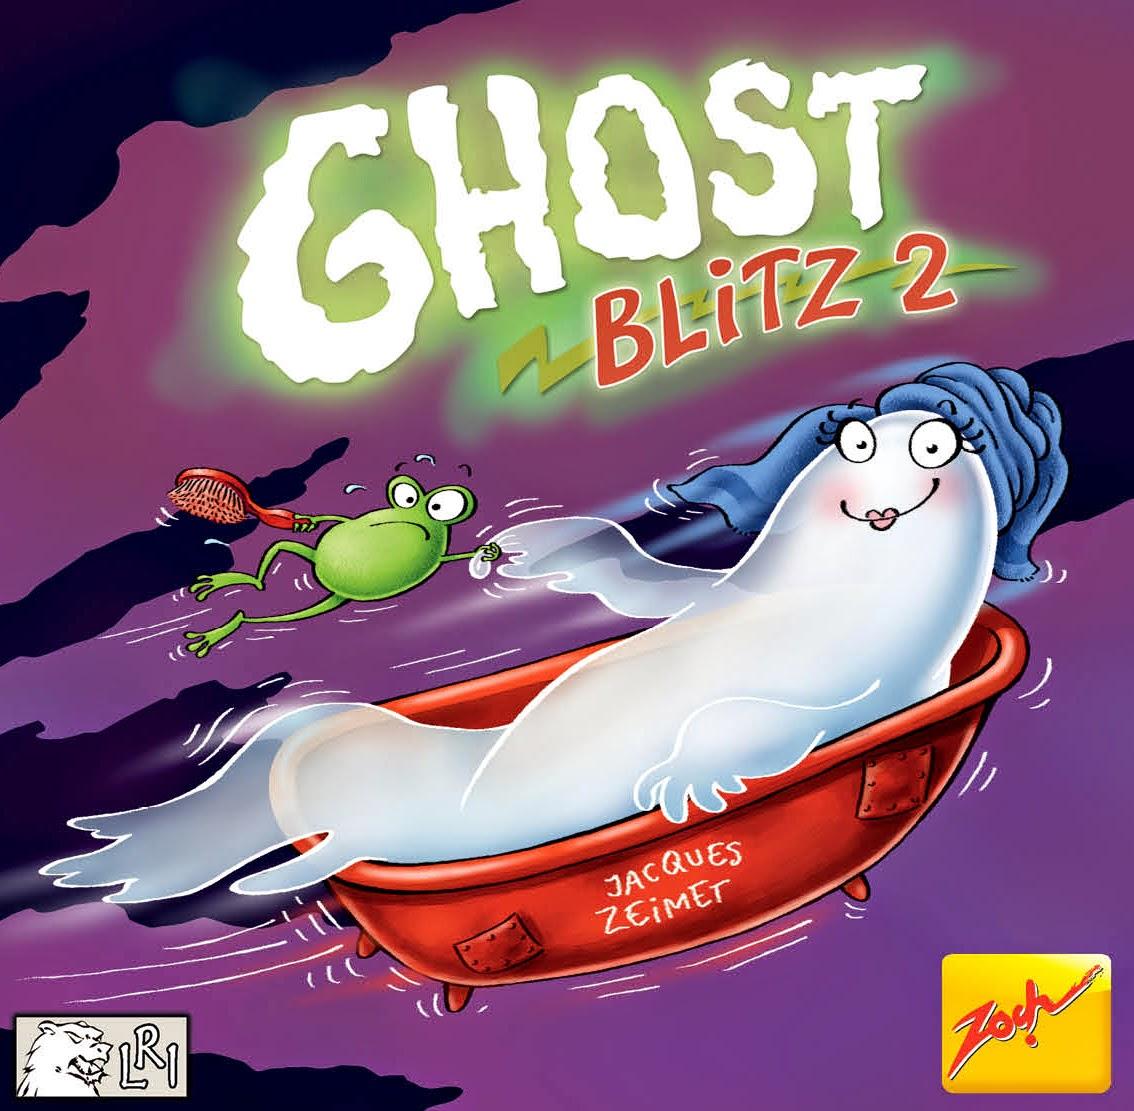 Ghost Blitz 2 by Zoch Verlag  - Board Game Box